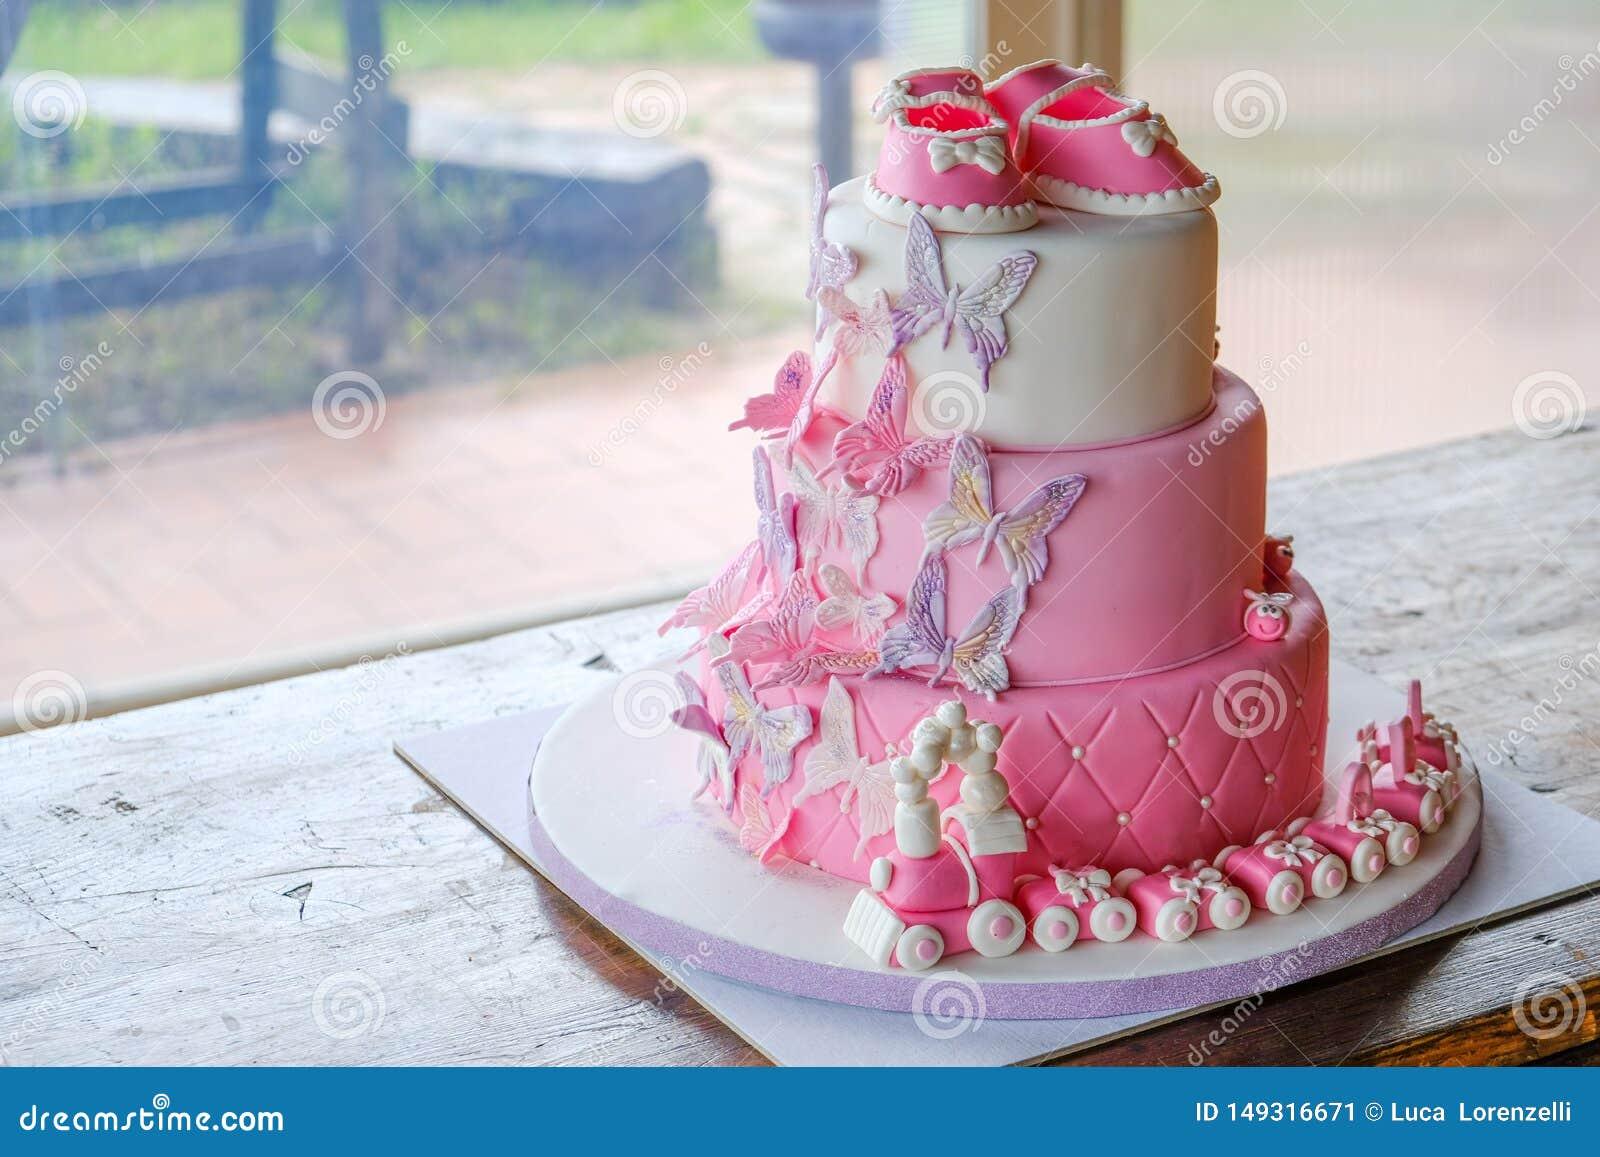 Swell Fist Cake For A Little Baby Girl Birthday For Celebrating Baptism Funny Birthday Cards Online Overcheapnameinfo